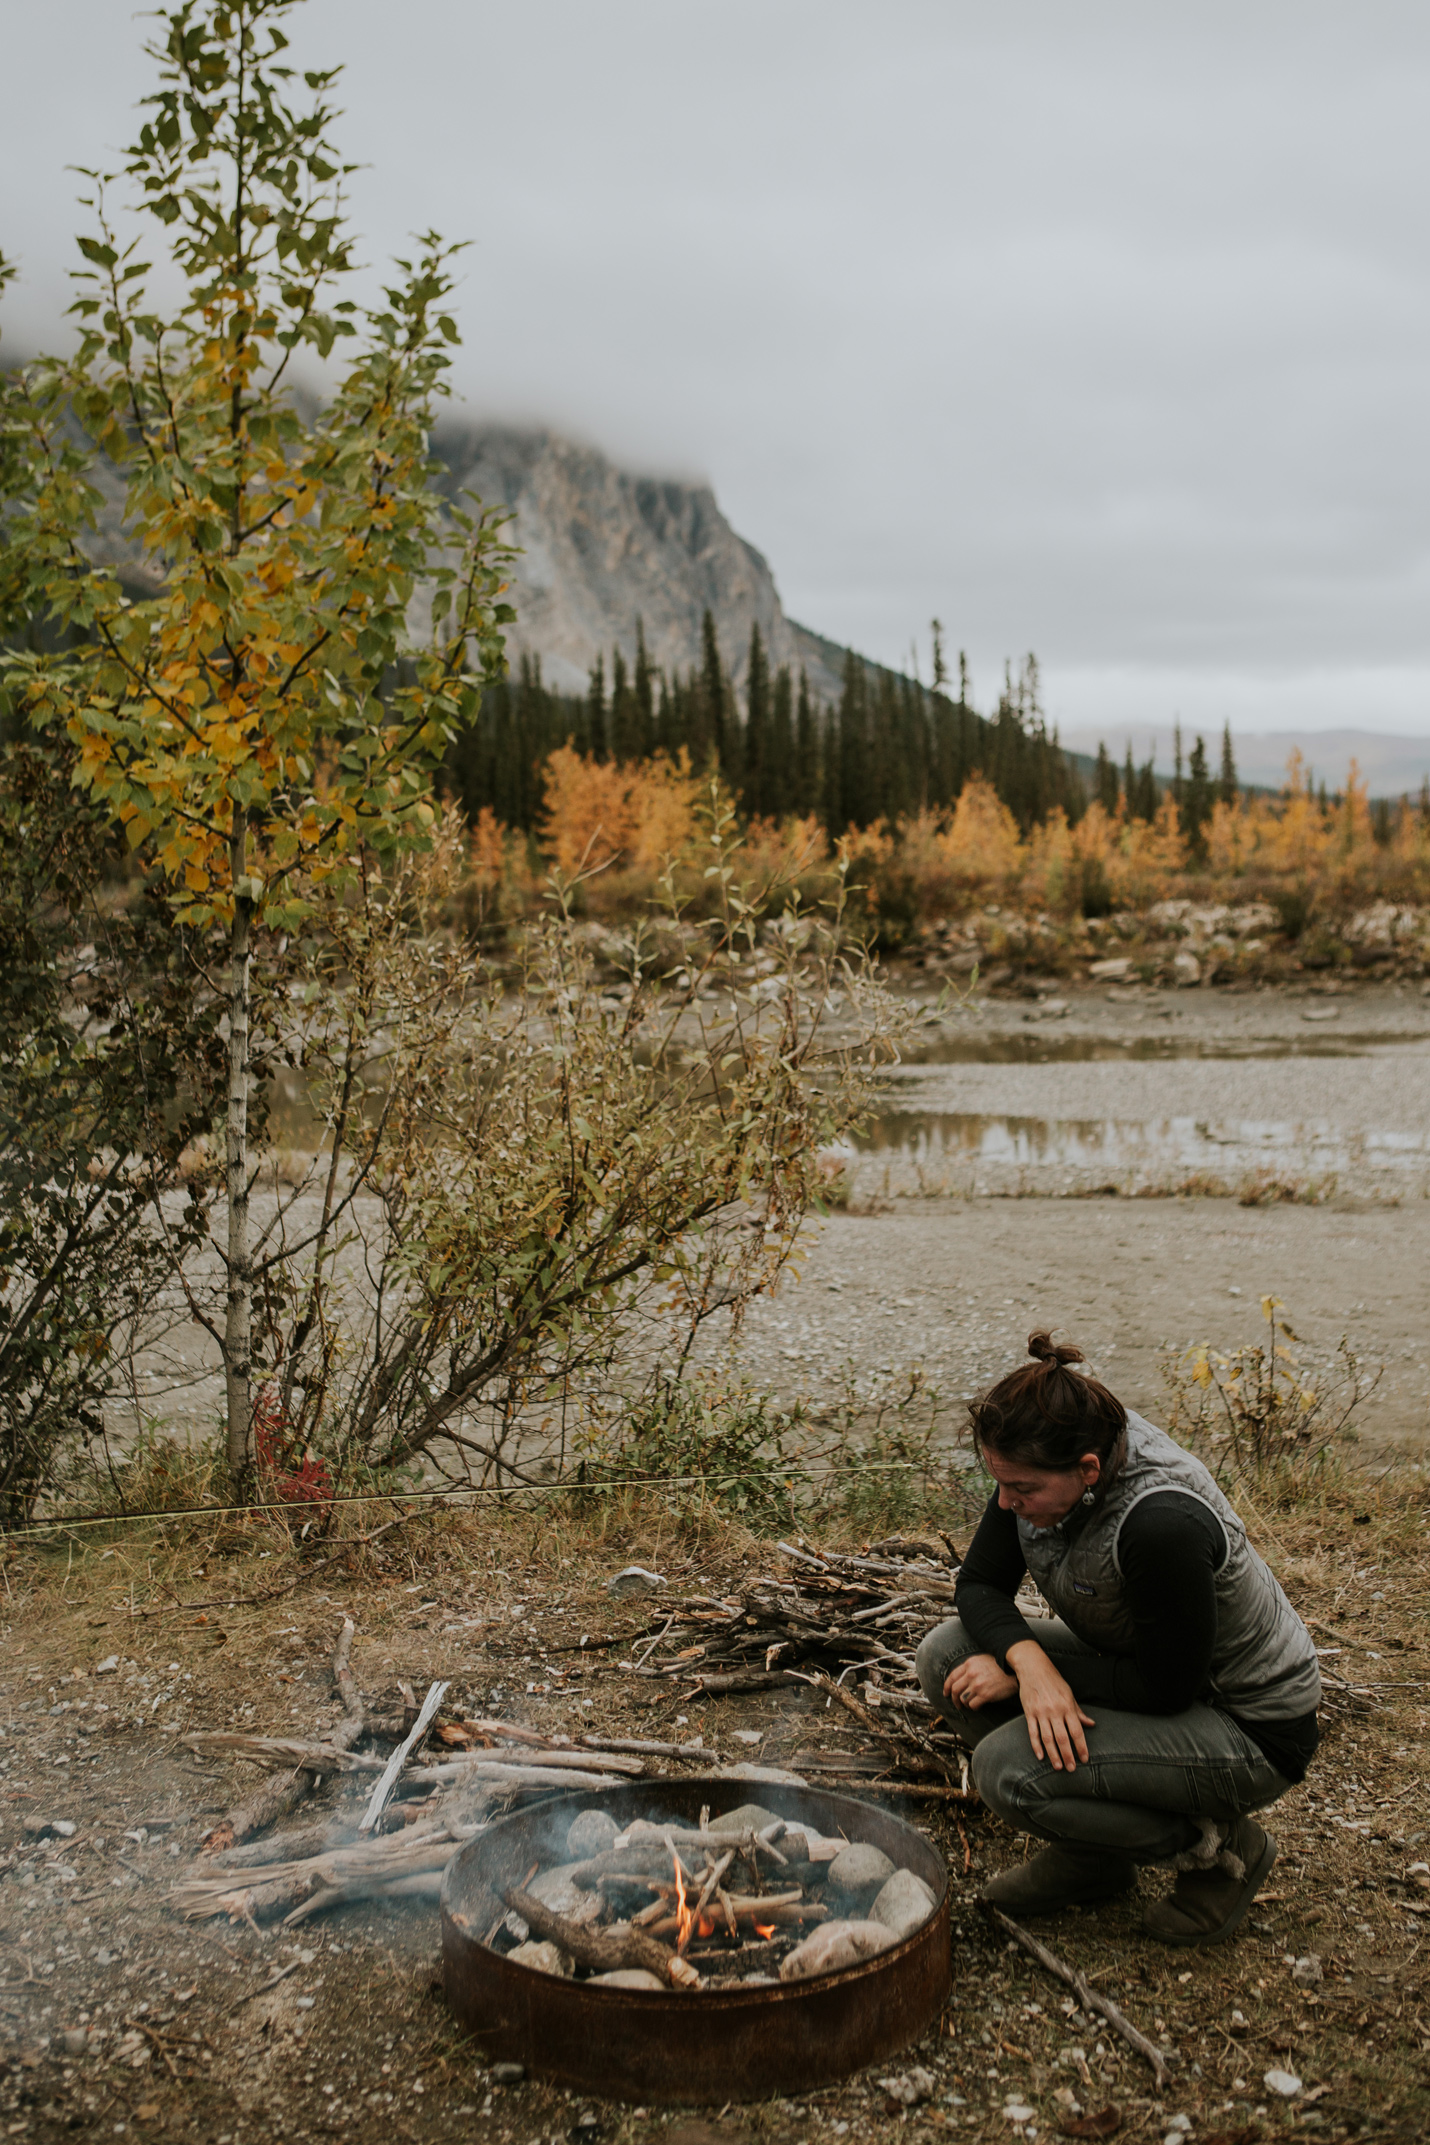 CindyGiovagnoli_Alaska_KoyukukRiver_SukakpakMountain_JimRiver_ArcticCircle_fly_fishing_September-010.jpg